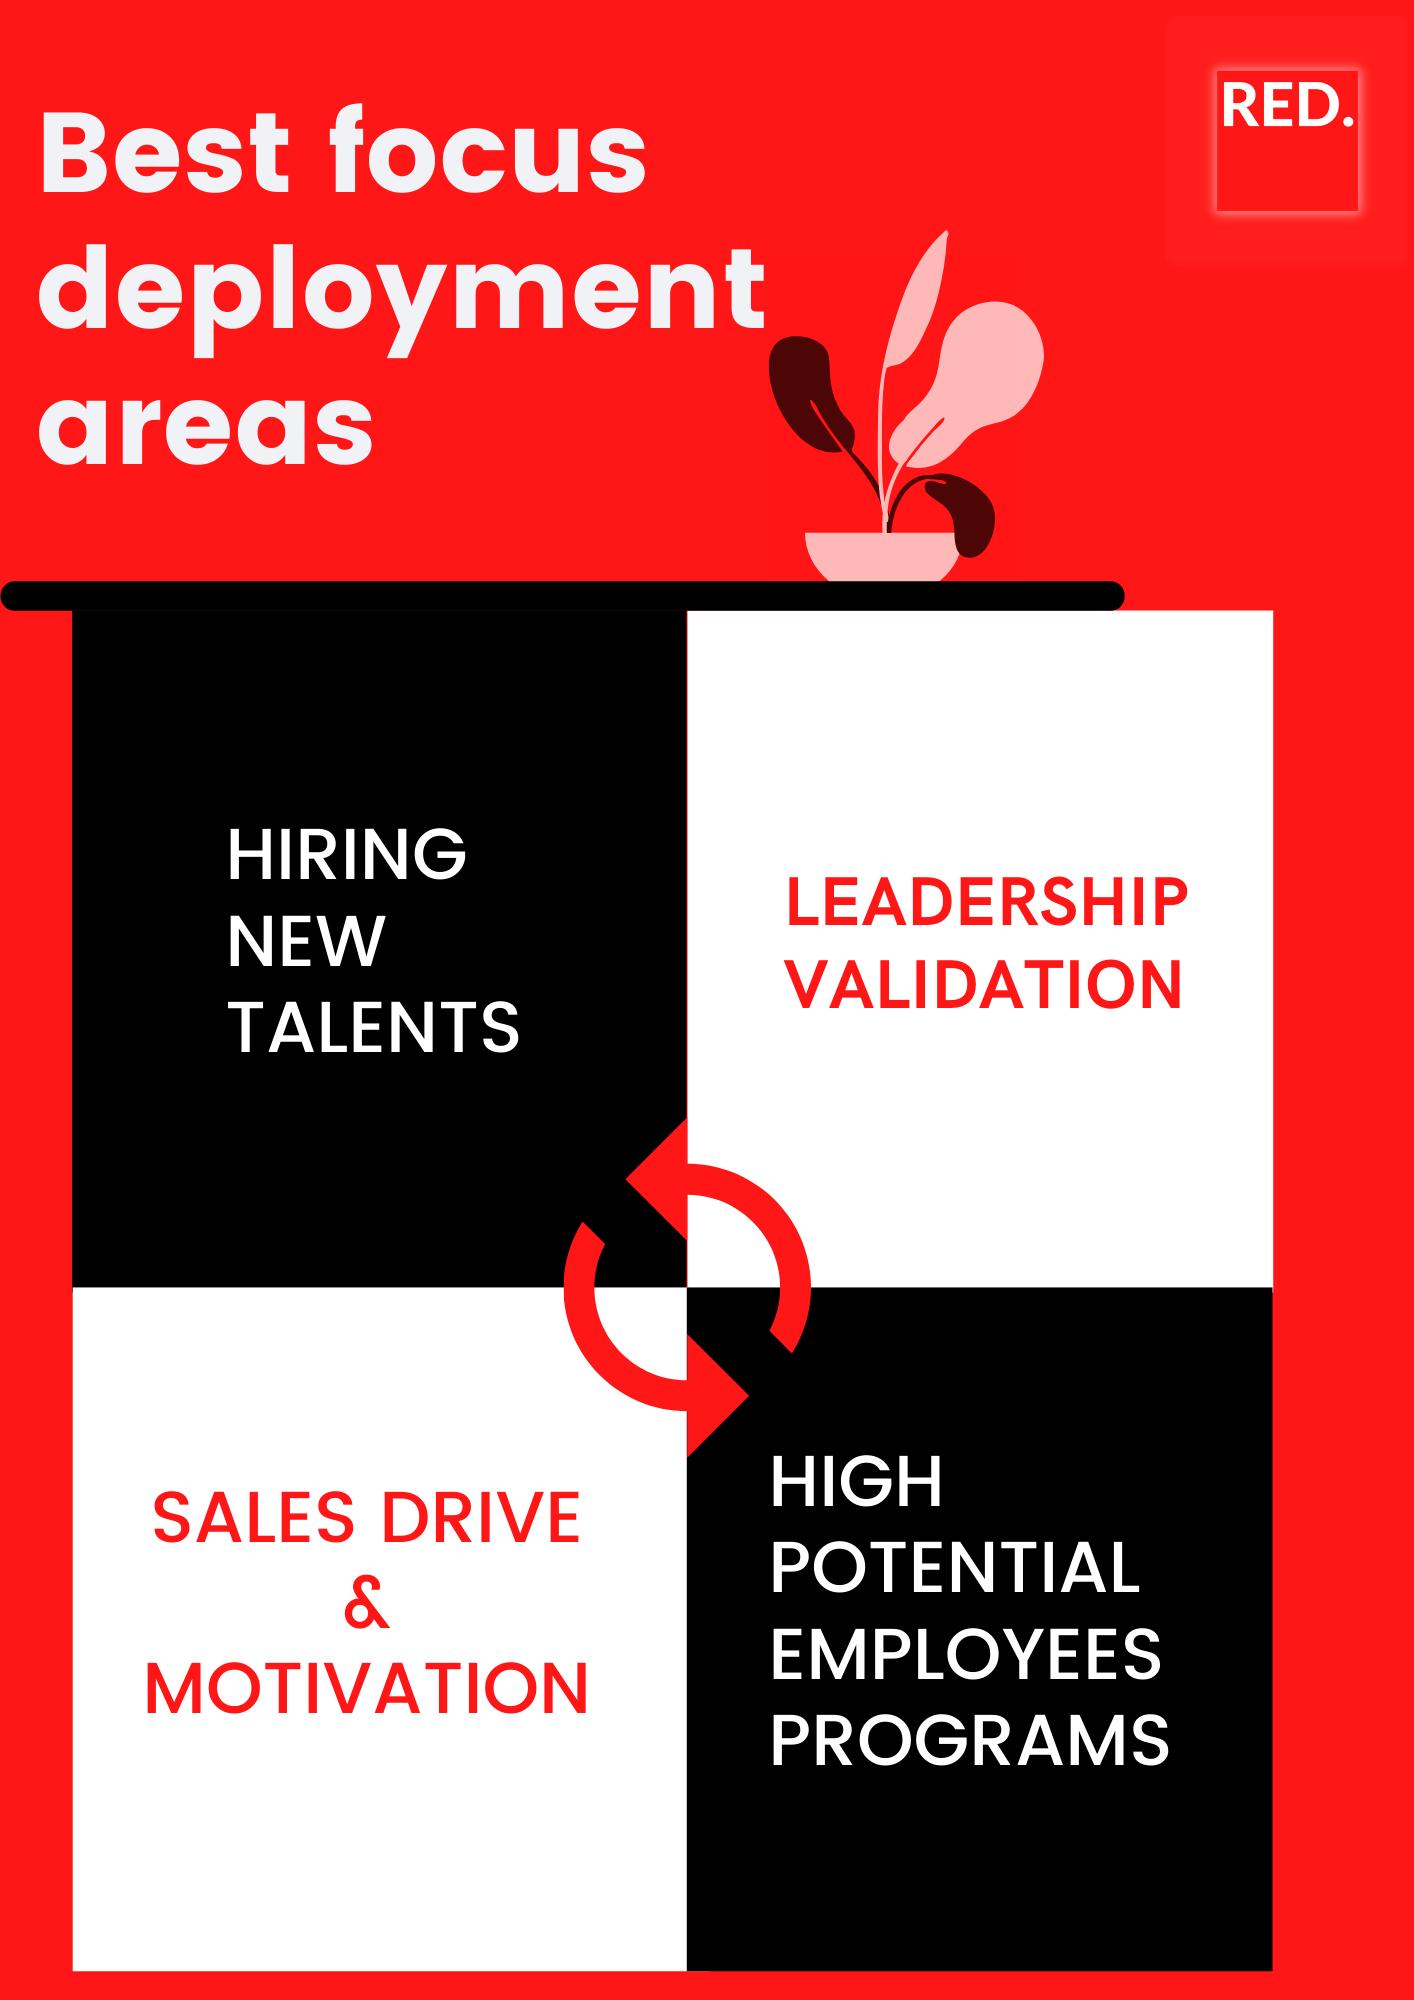 best focus deployment areas RED. Recruitment assessments